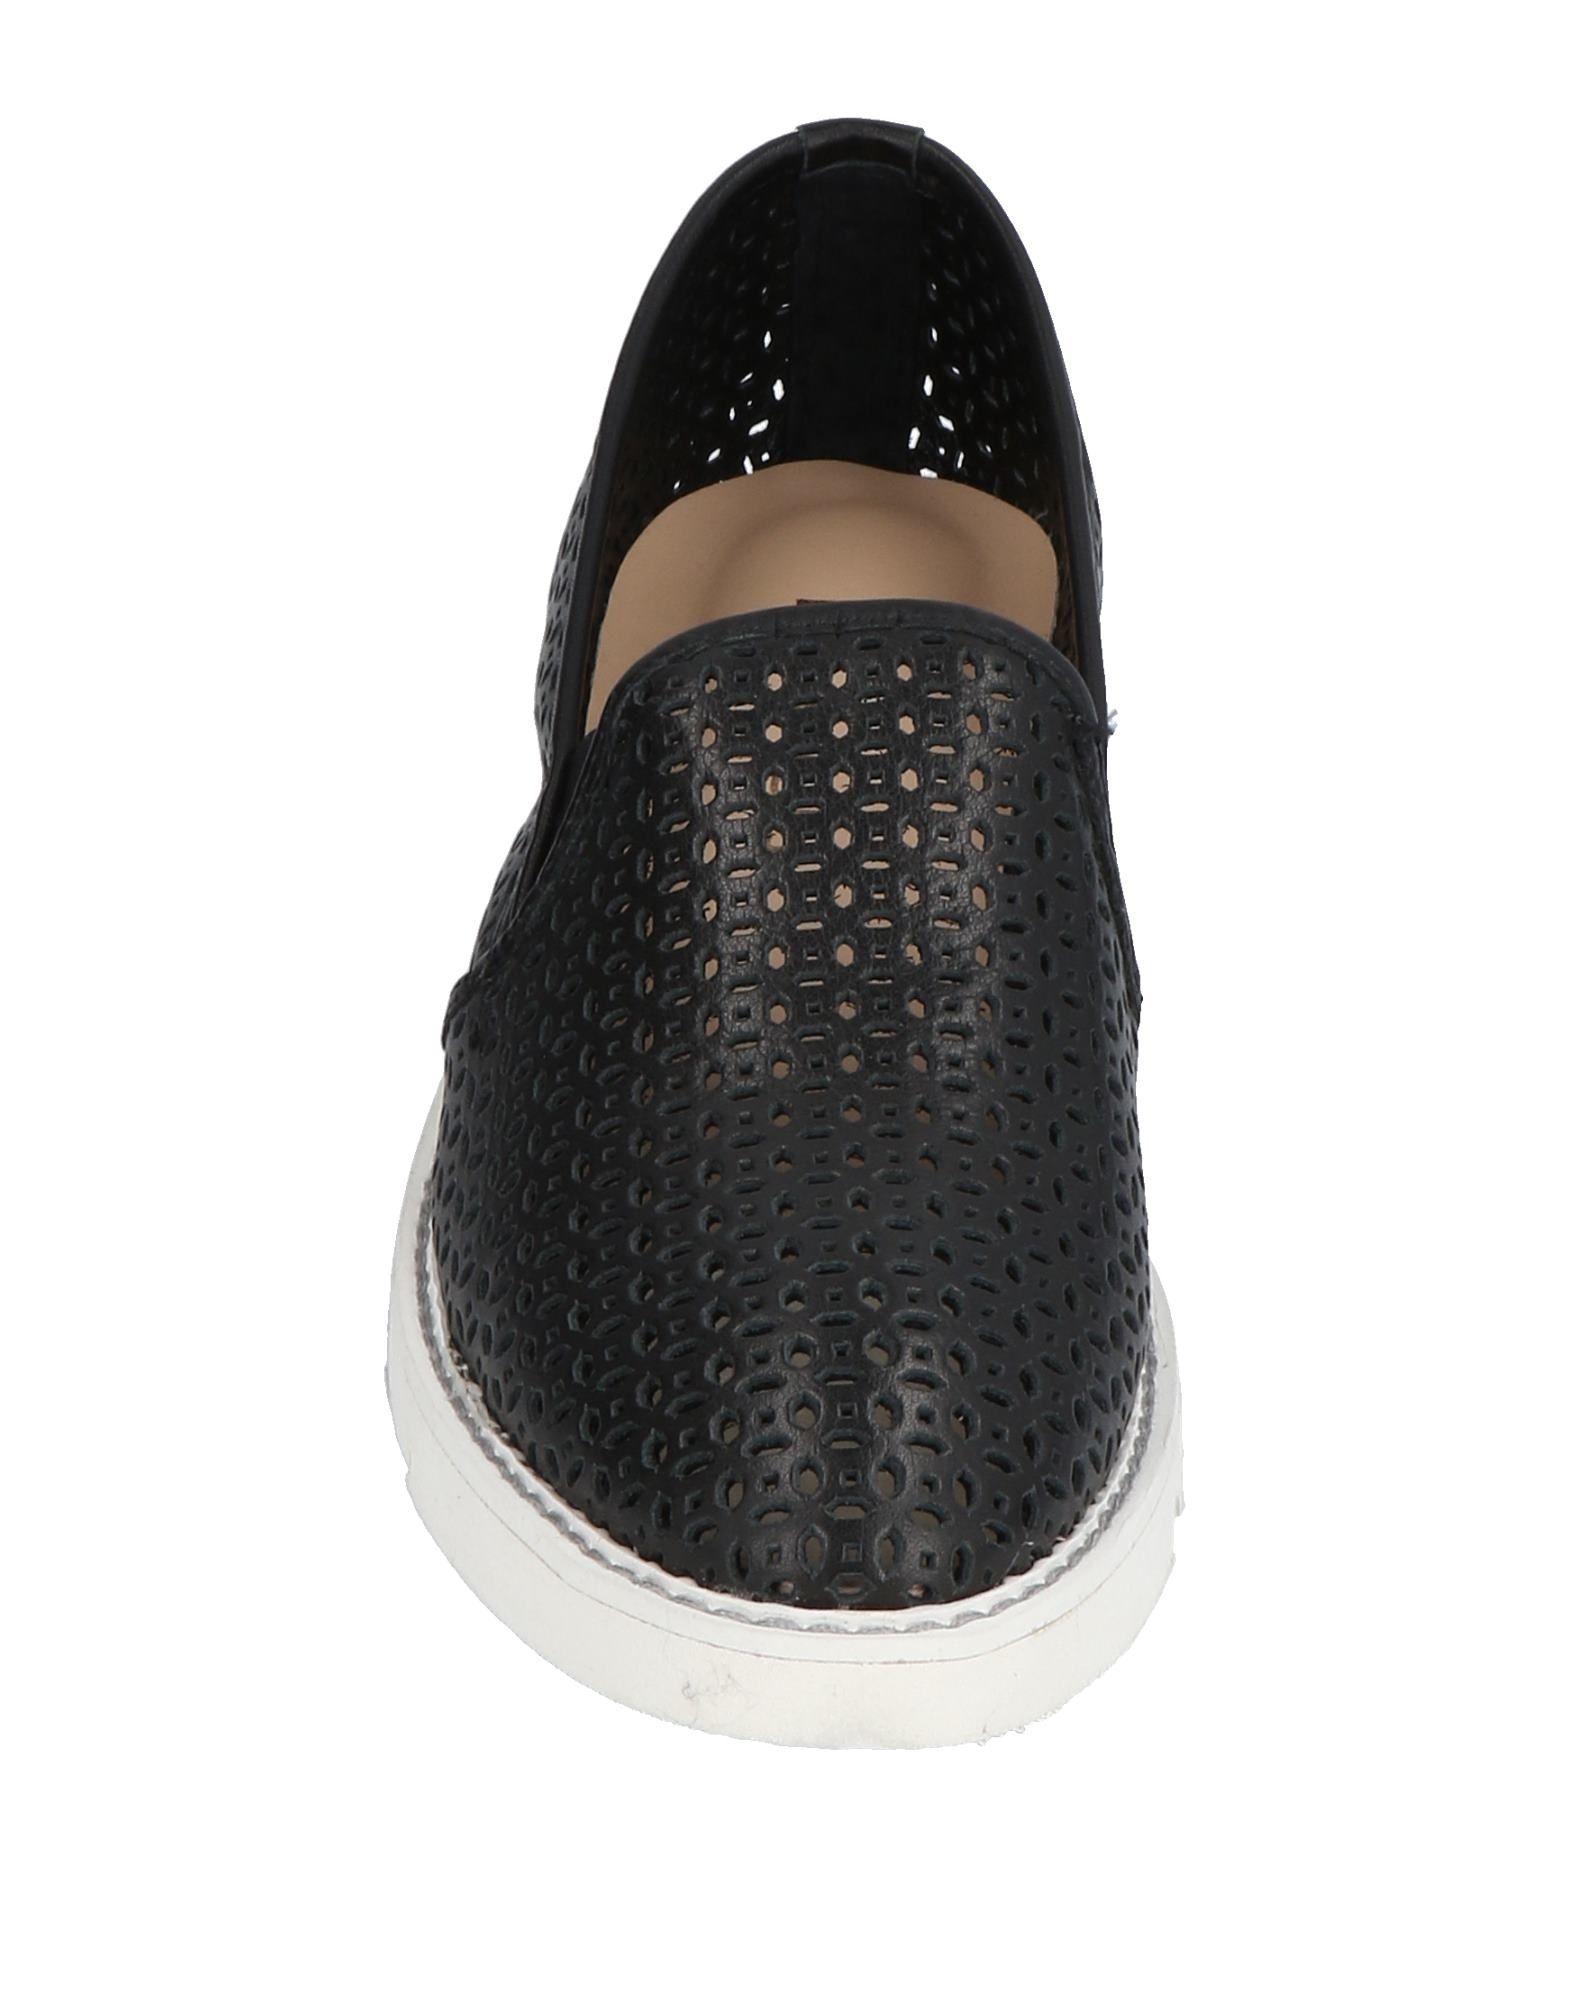 Stilvolle Günstige billige Schuhe Lea 11472487NW Günstige Stilvolle und langlebige Schuhe d9c4d0